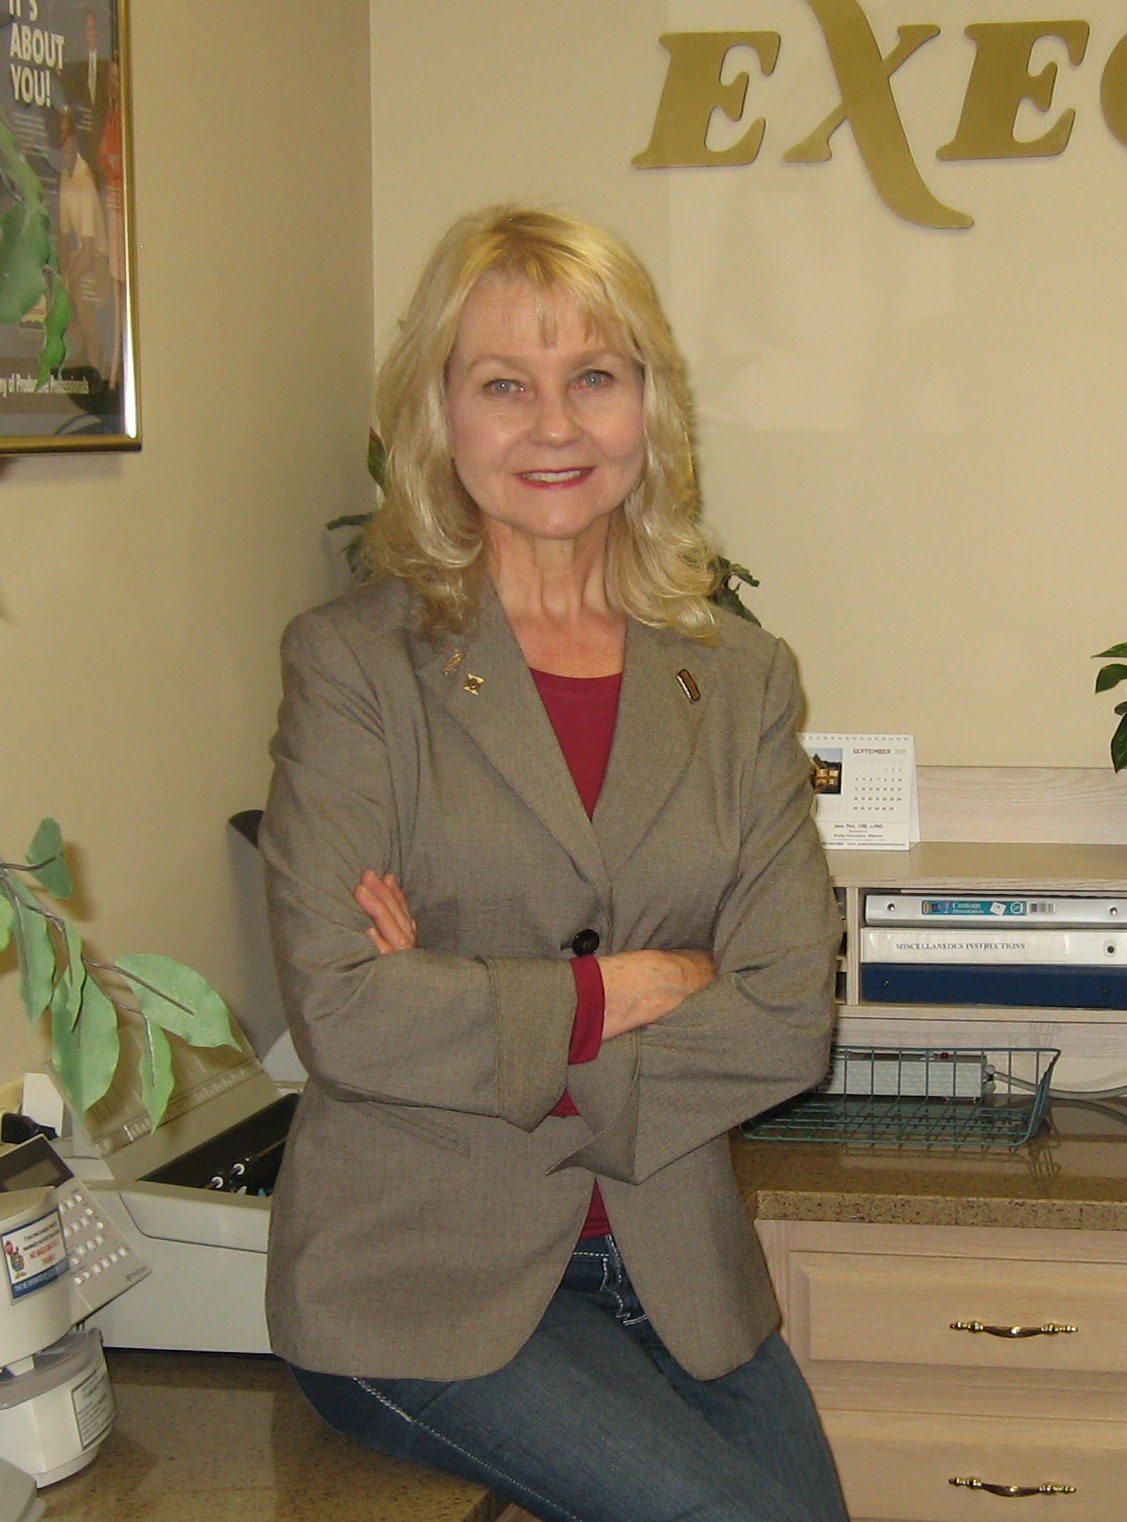 Jana at front desk